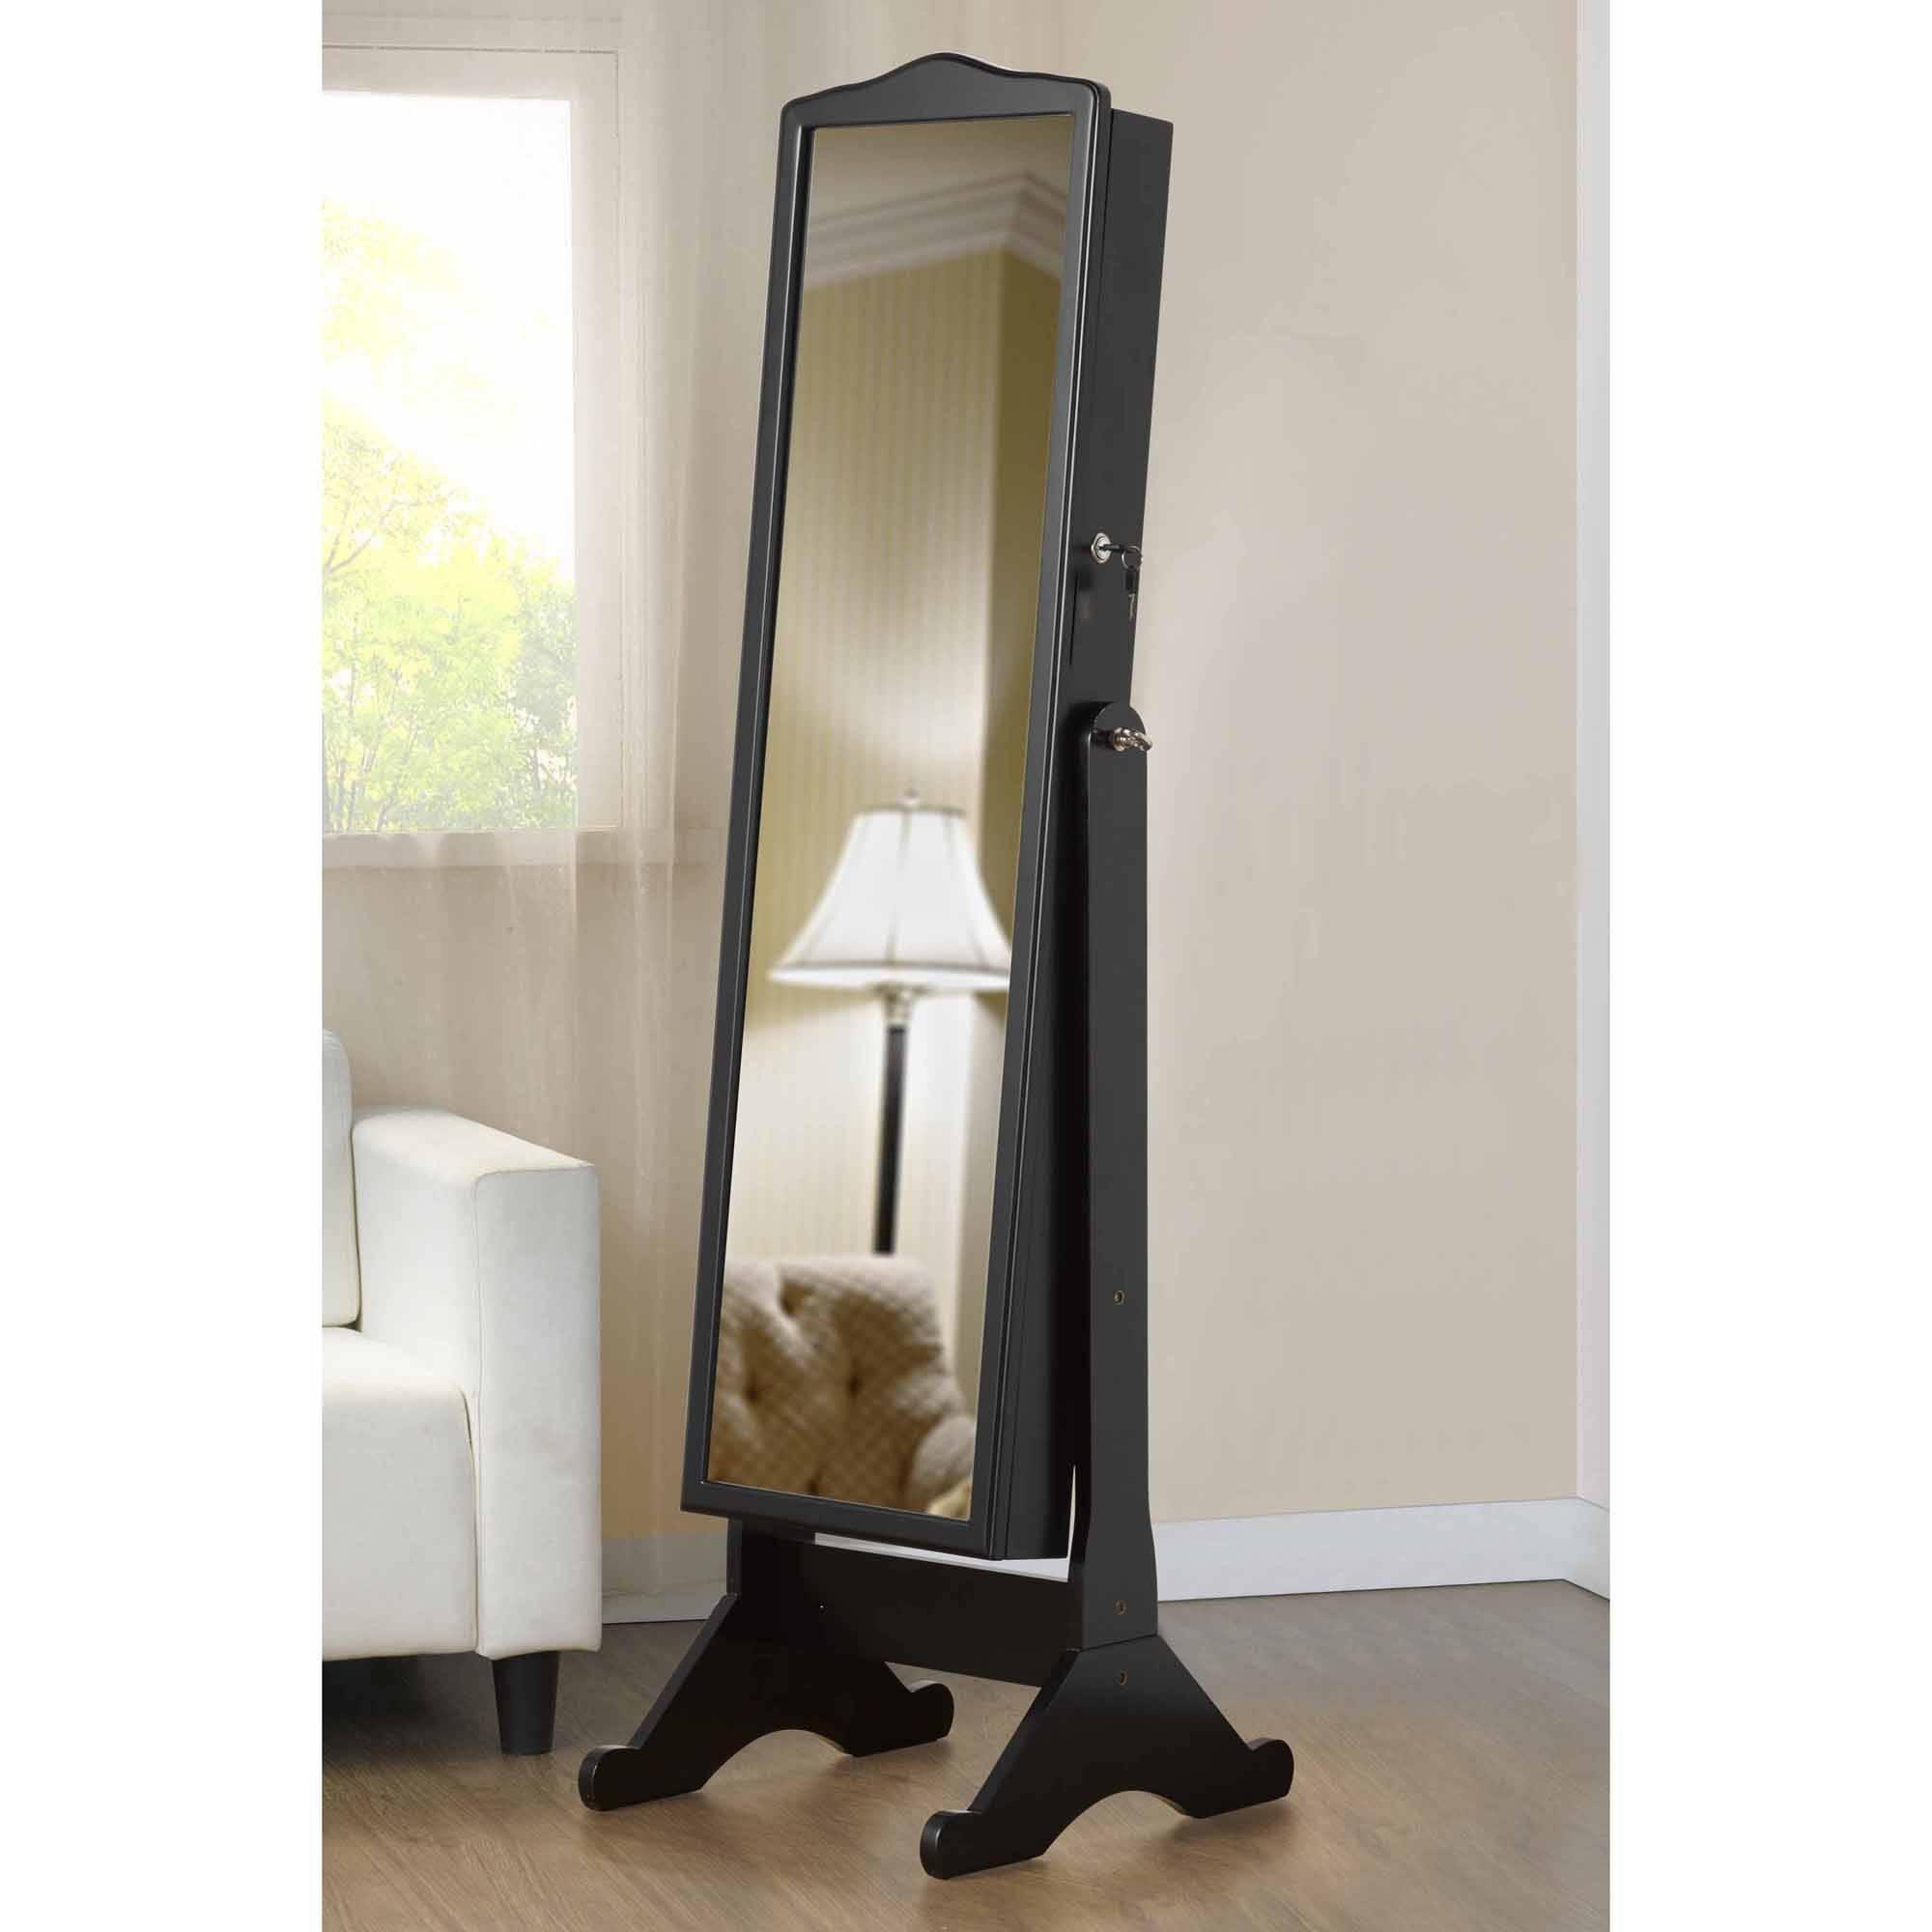 Flooring Flooring Decorative Full Length Wallror Regarding Decorative Full Length Mirror (View 8 of 15)